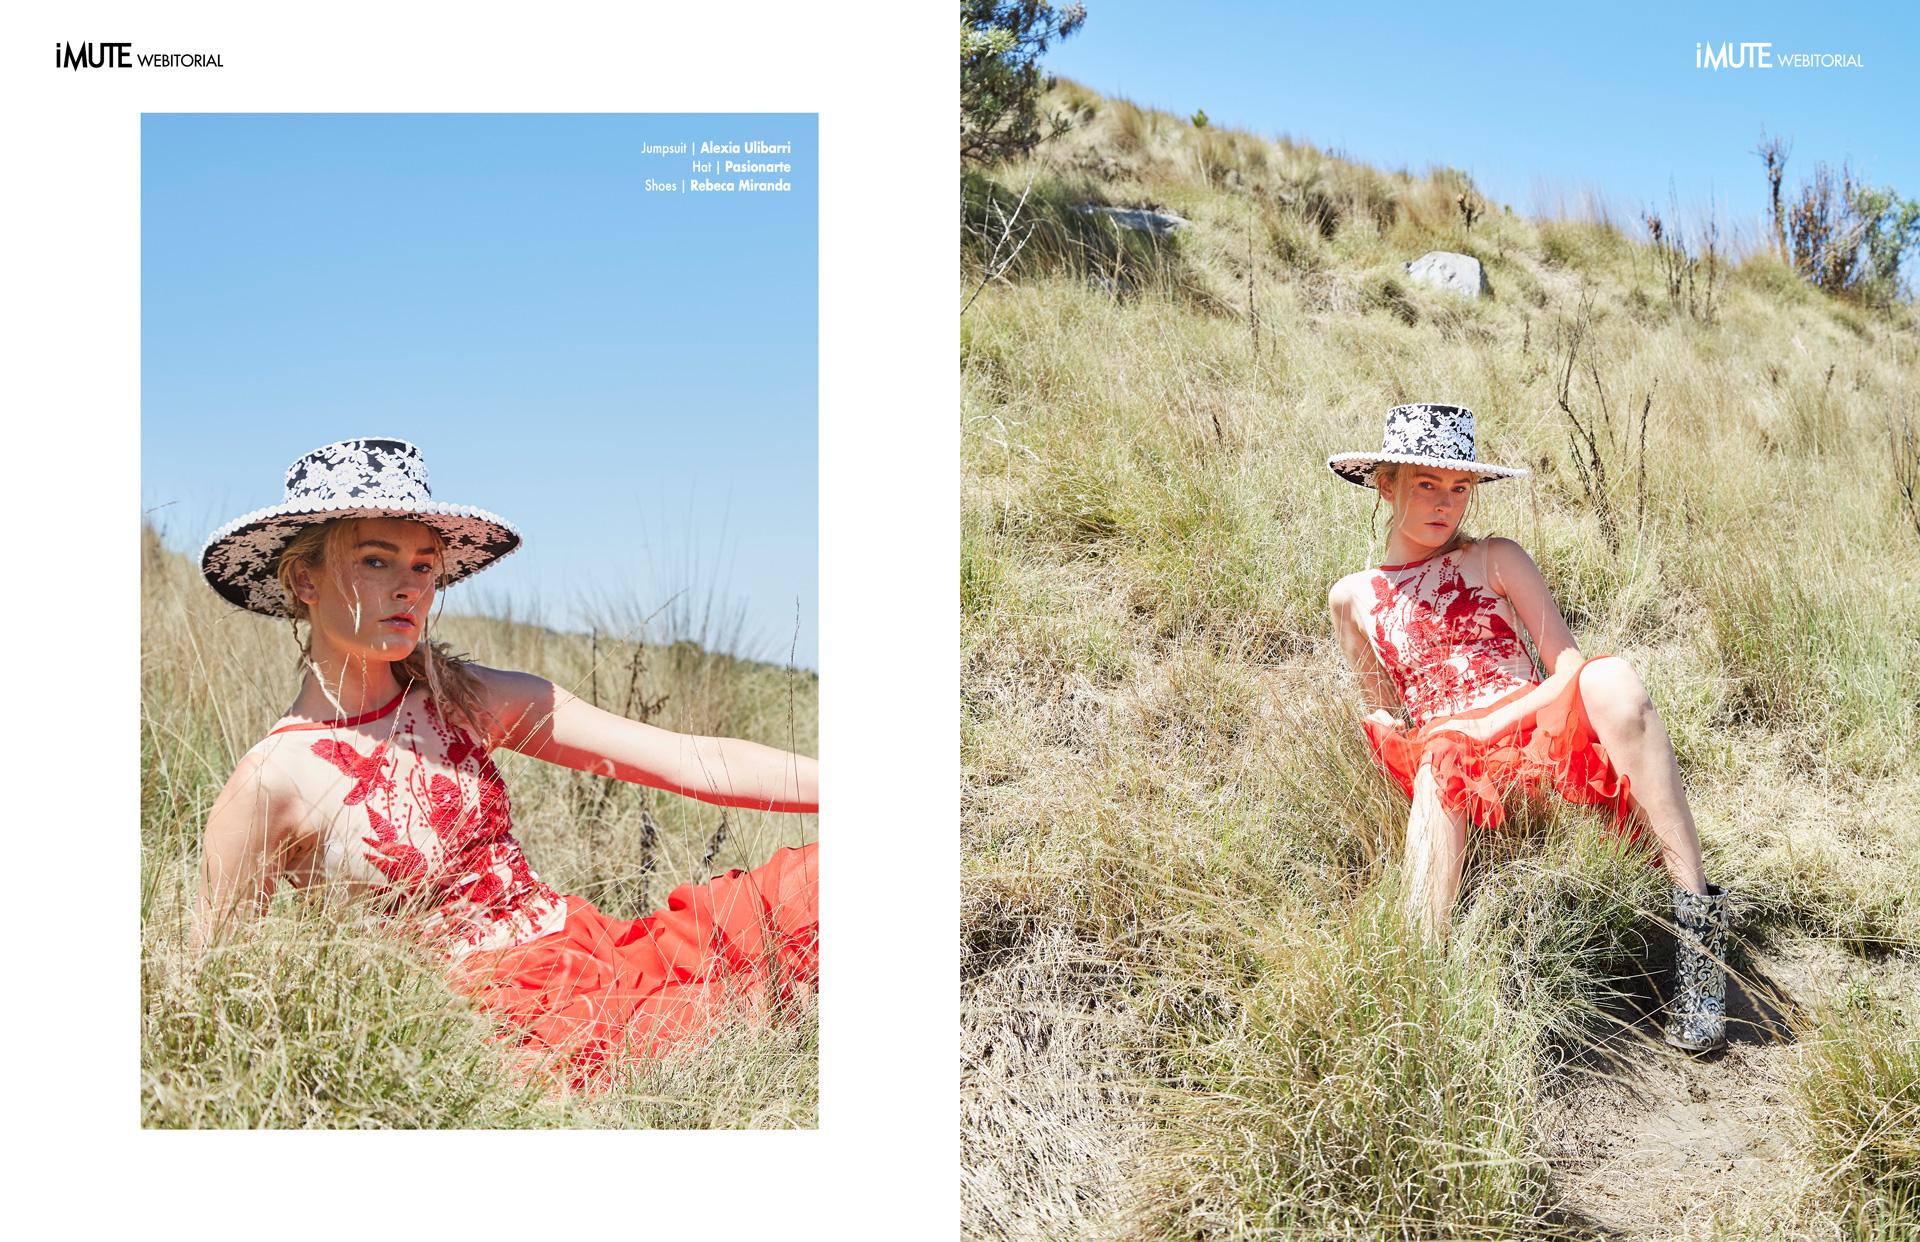 Inside the Mountain webitorial for iMute Magazine Photographer Diego Valdivia Model  Allison Lancaster @GH Management Stylist Alonso Murillo Makeup & Hair Luis Gil Photo Assistant  Raziel Mendoza